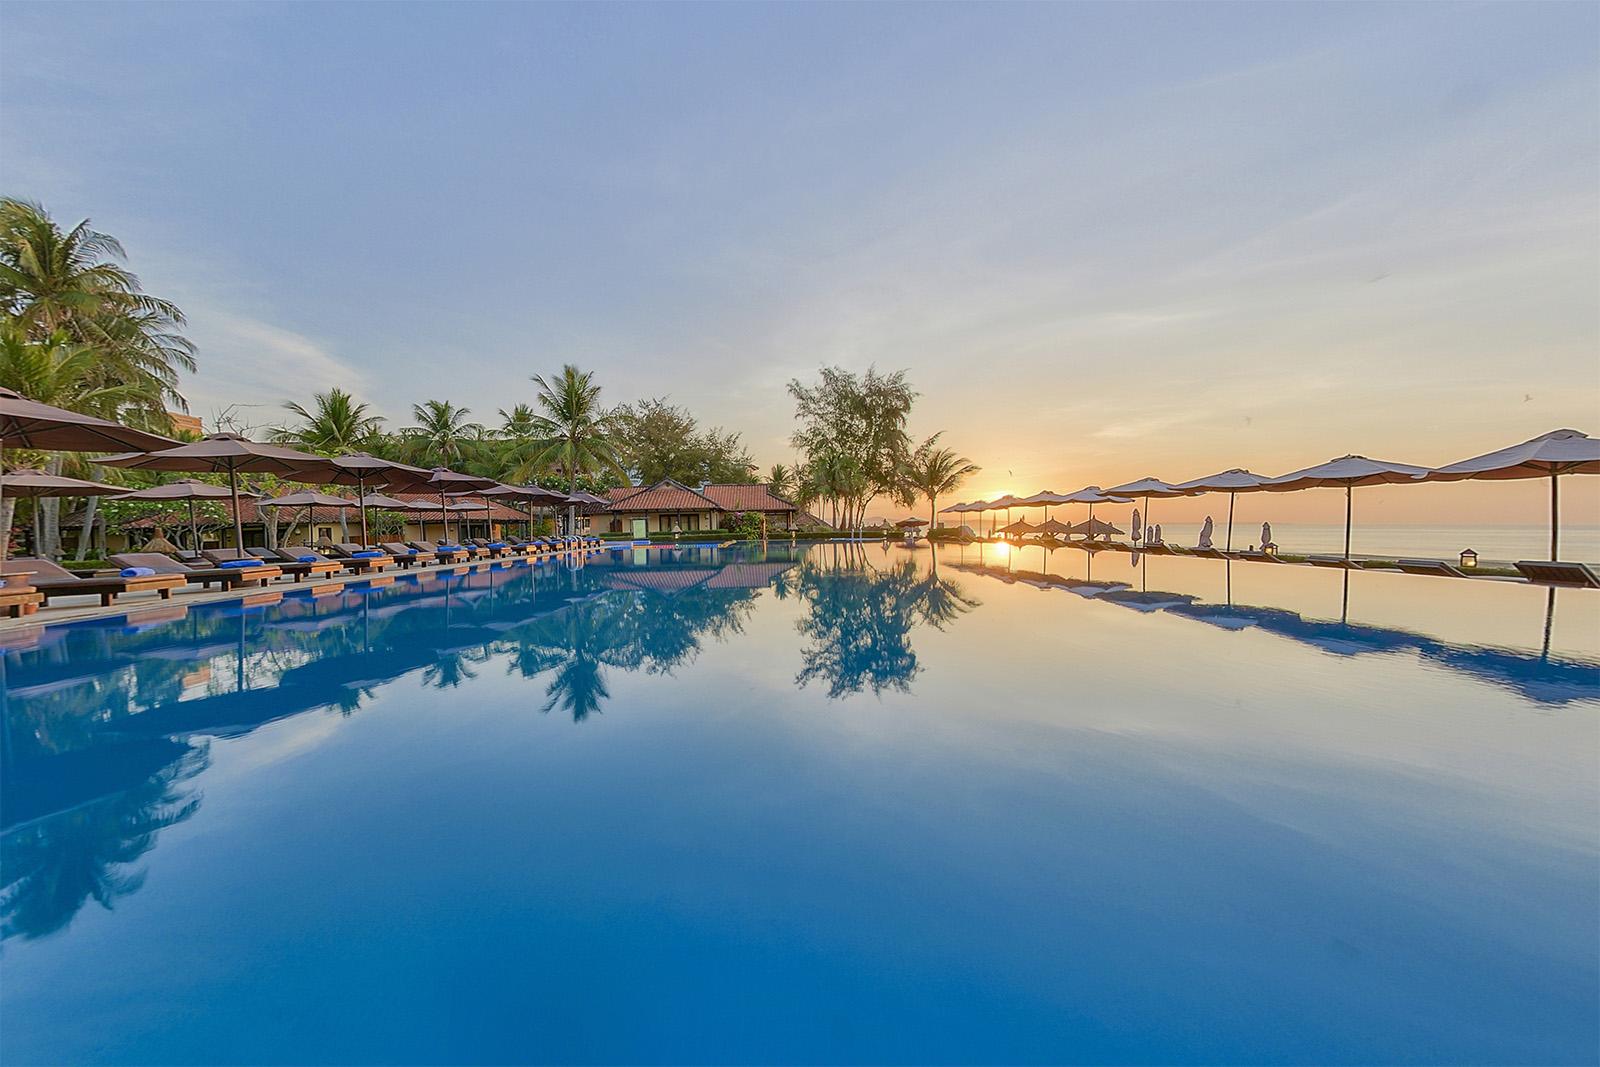 Seahorse-Resort-Spa-Phan-Thiet-ivivu-8